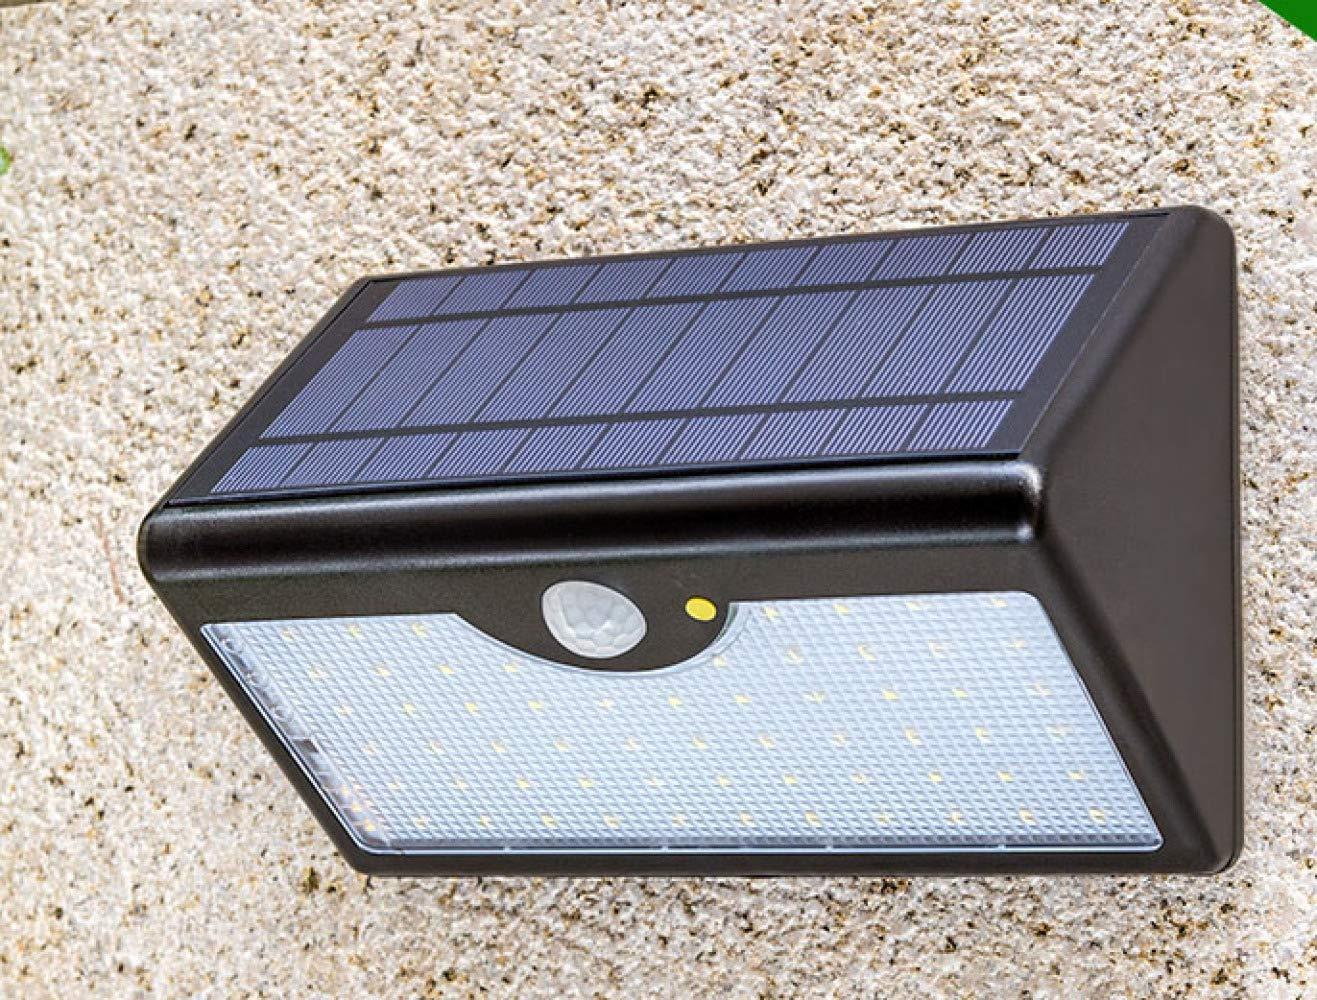 Qoo energia solare led esterno staccionata giardino applique